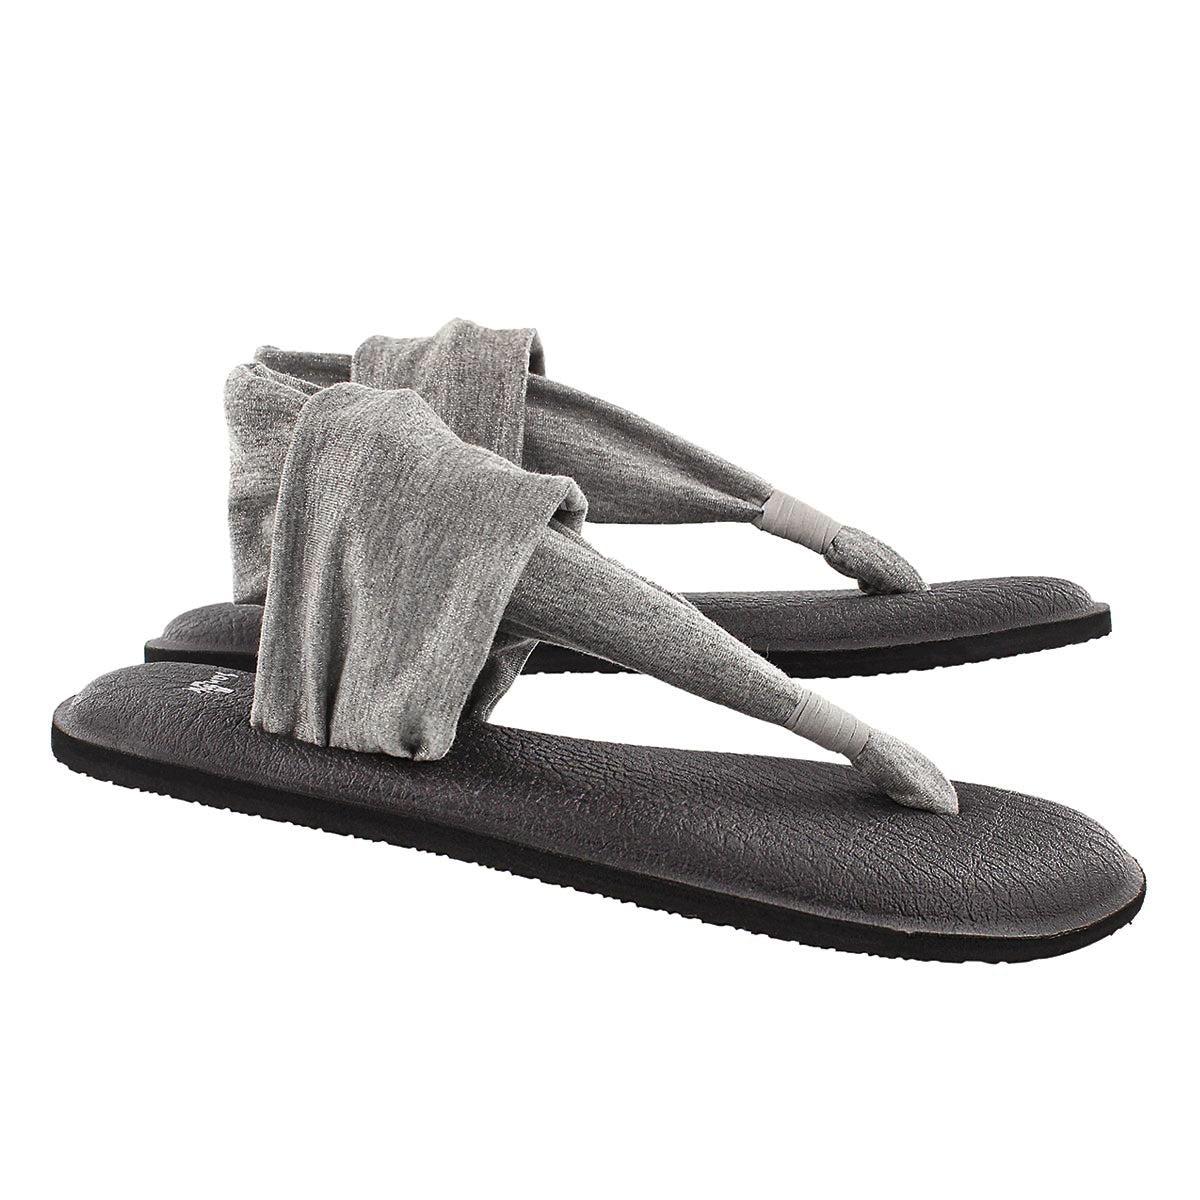 Sandale tong Yoga Sling, argent mét, fem